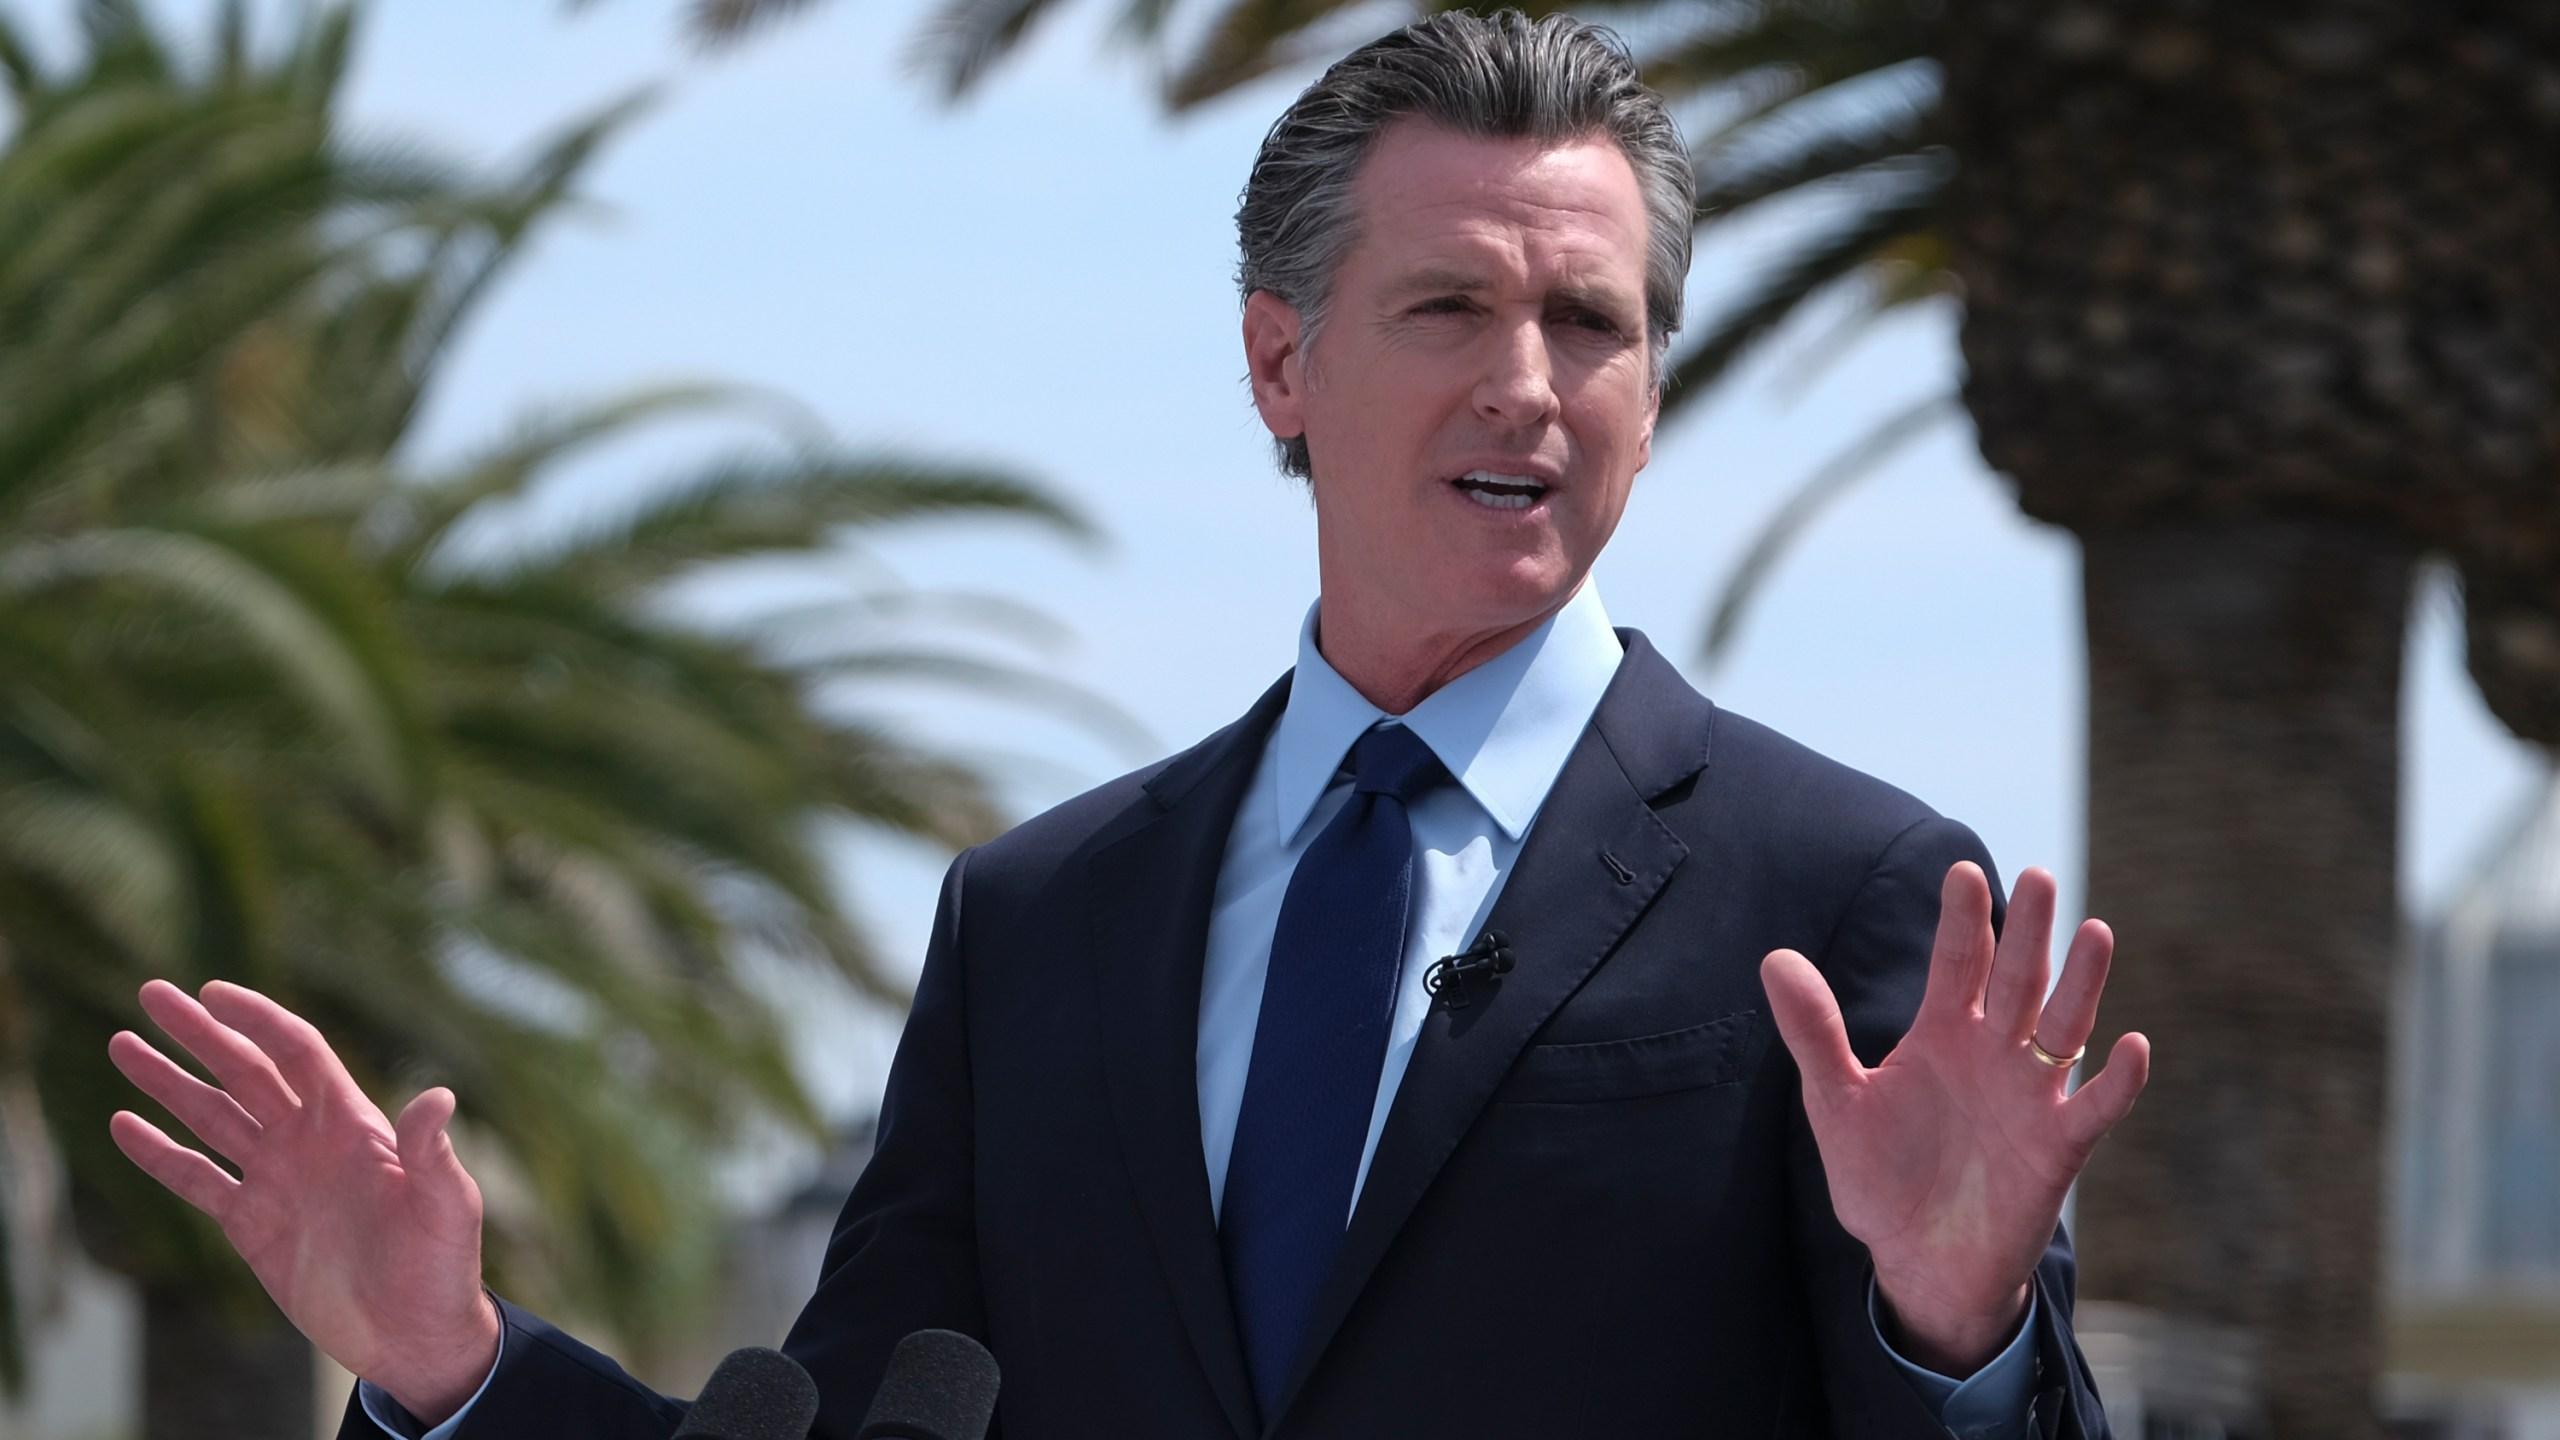 California Gov. Gavin Newsom talks during a news conference at Universal Studios Hollywood on June 25, 2021. (Ringo H.W. Chiu / Associated Press)